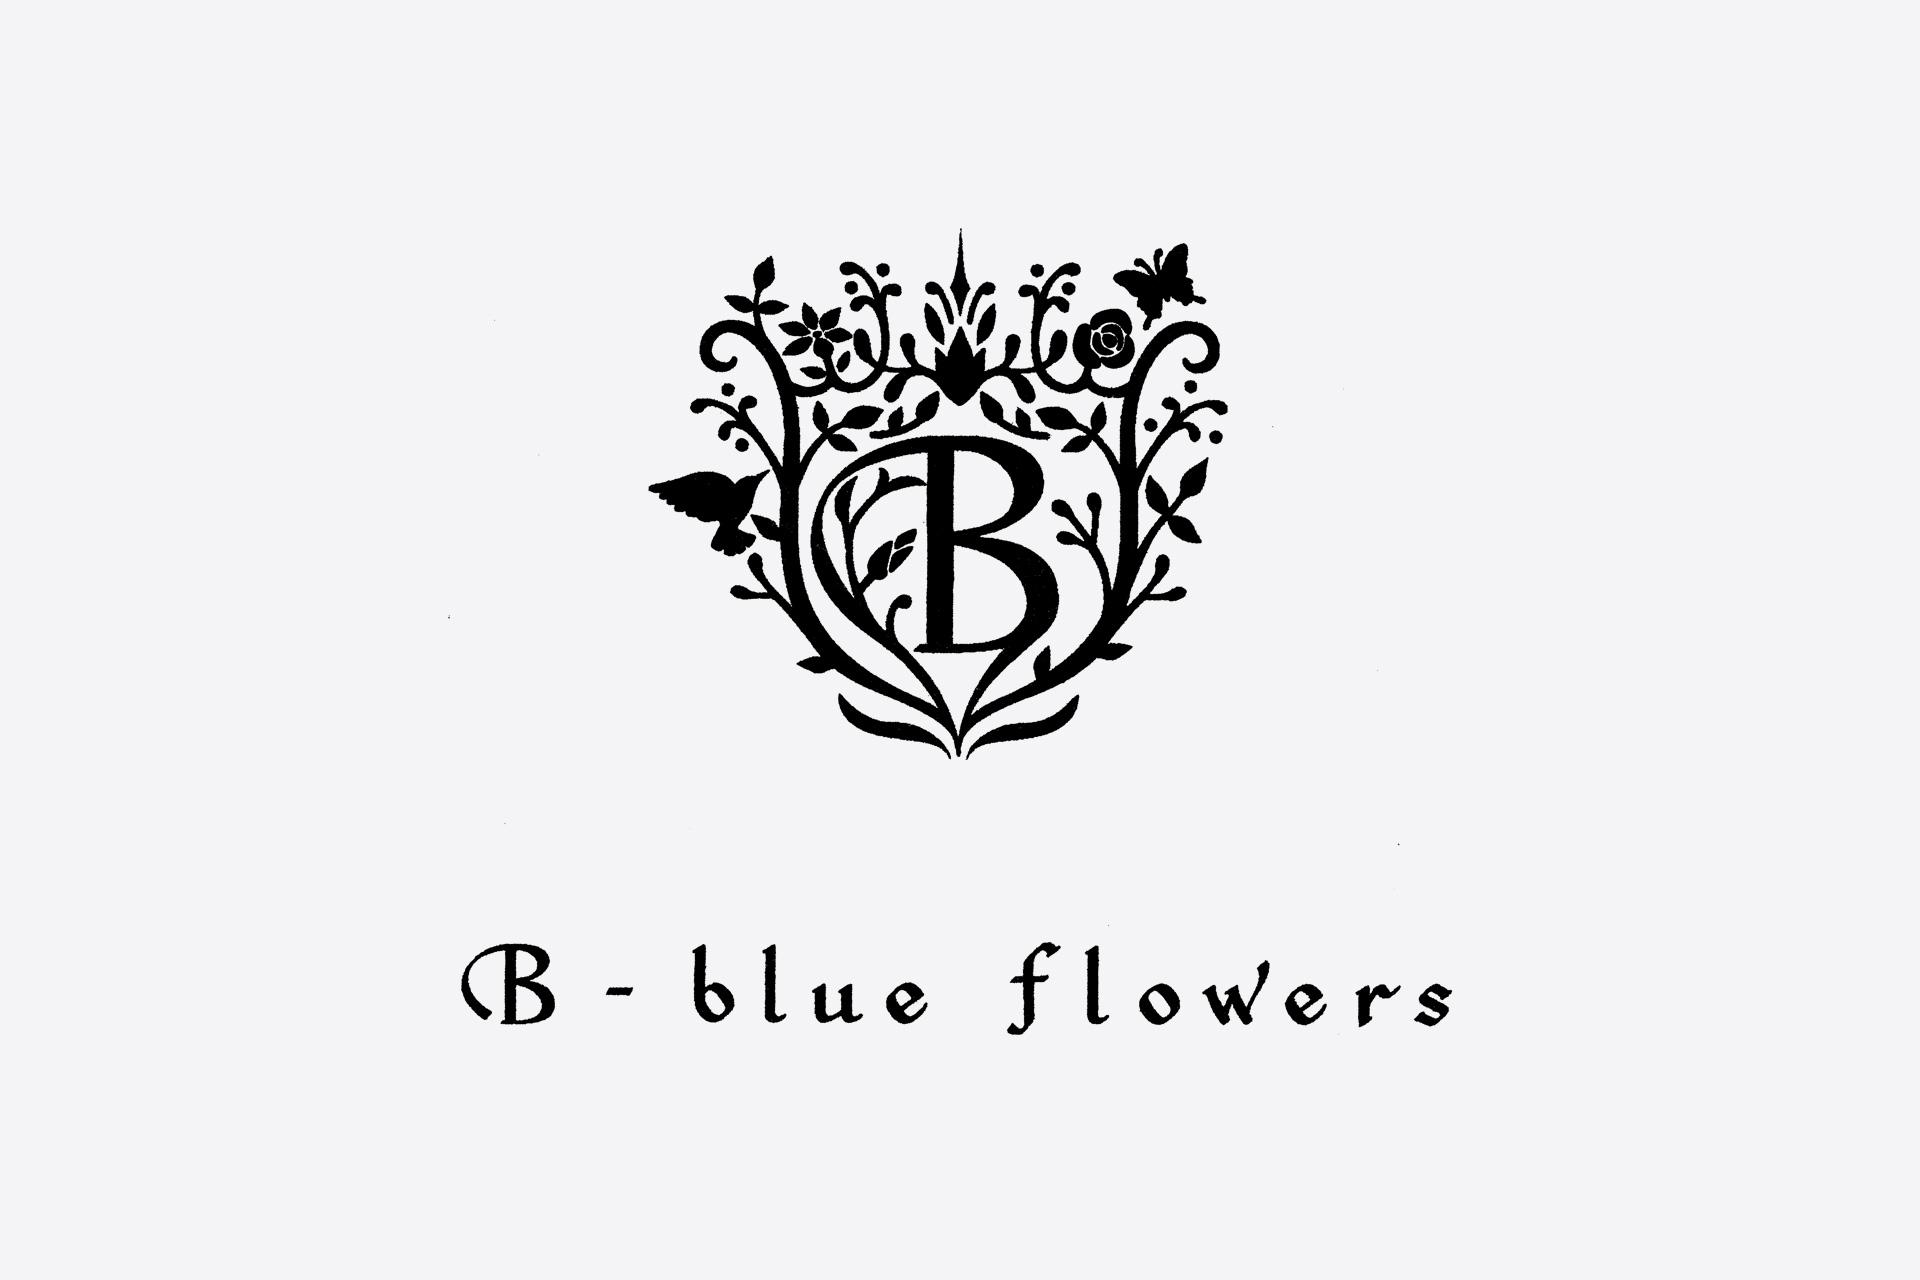 B-blue flowers